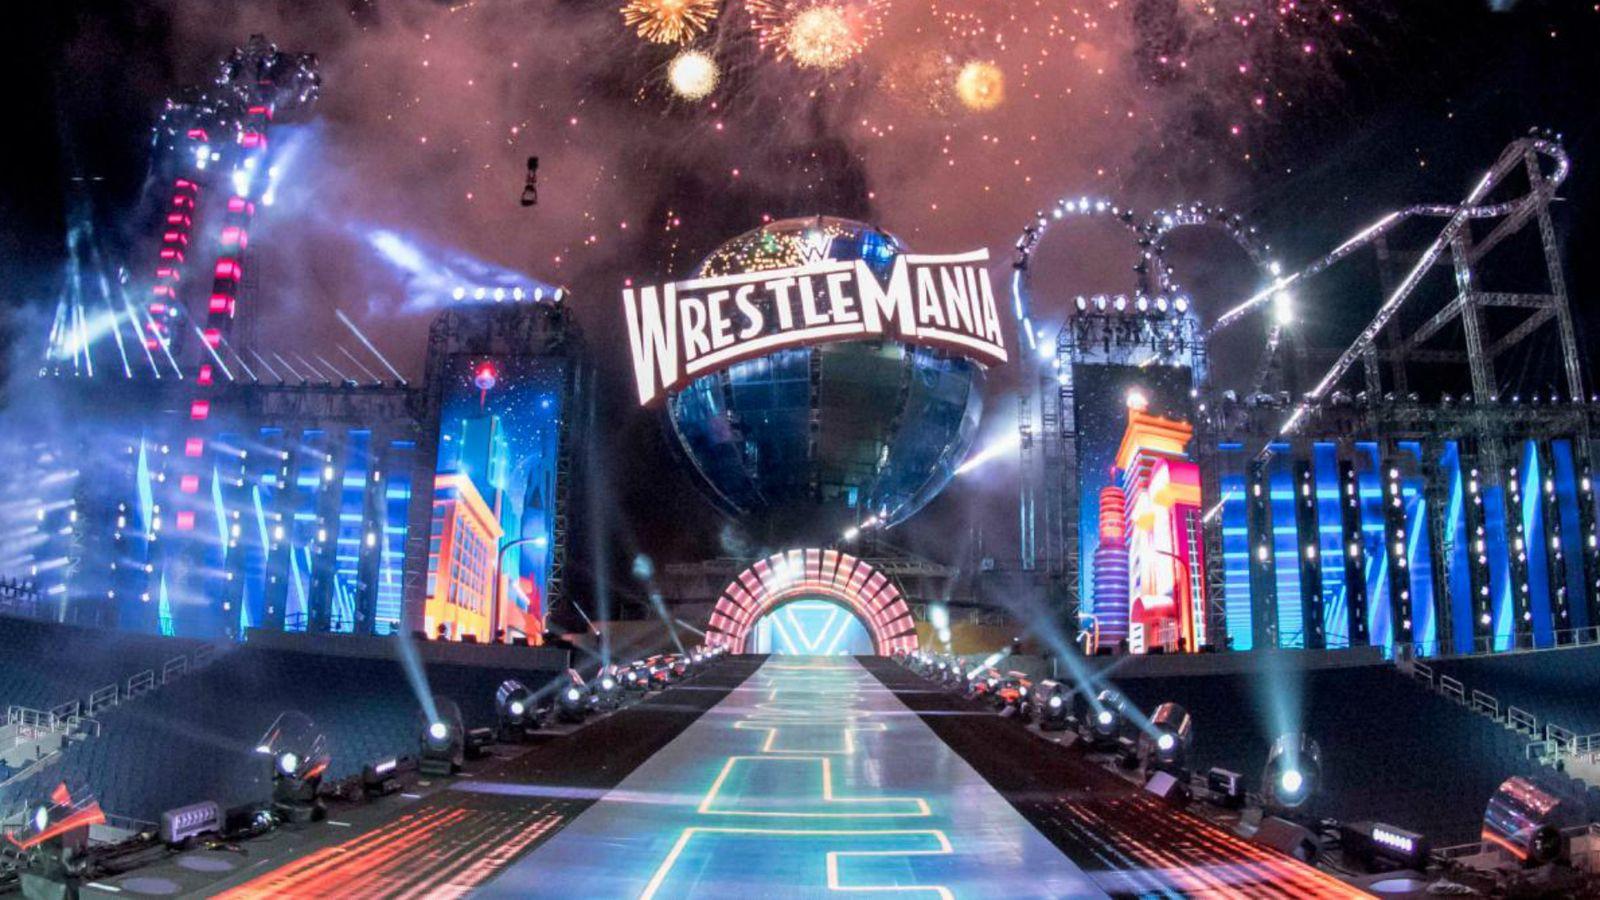 Wrestlemania 33 Sky